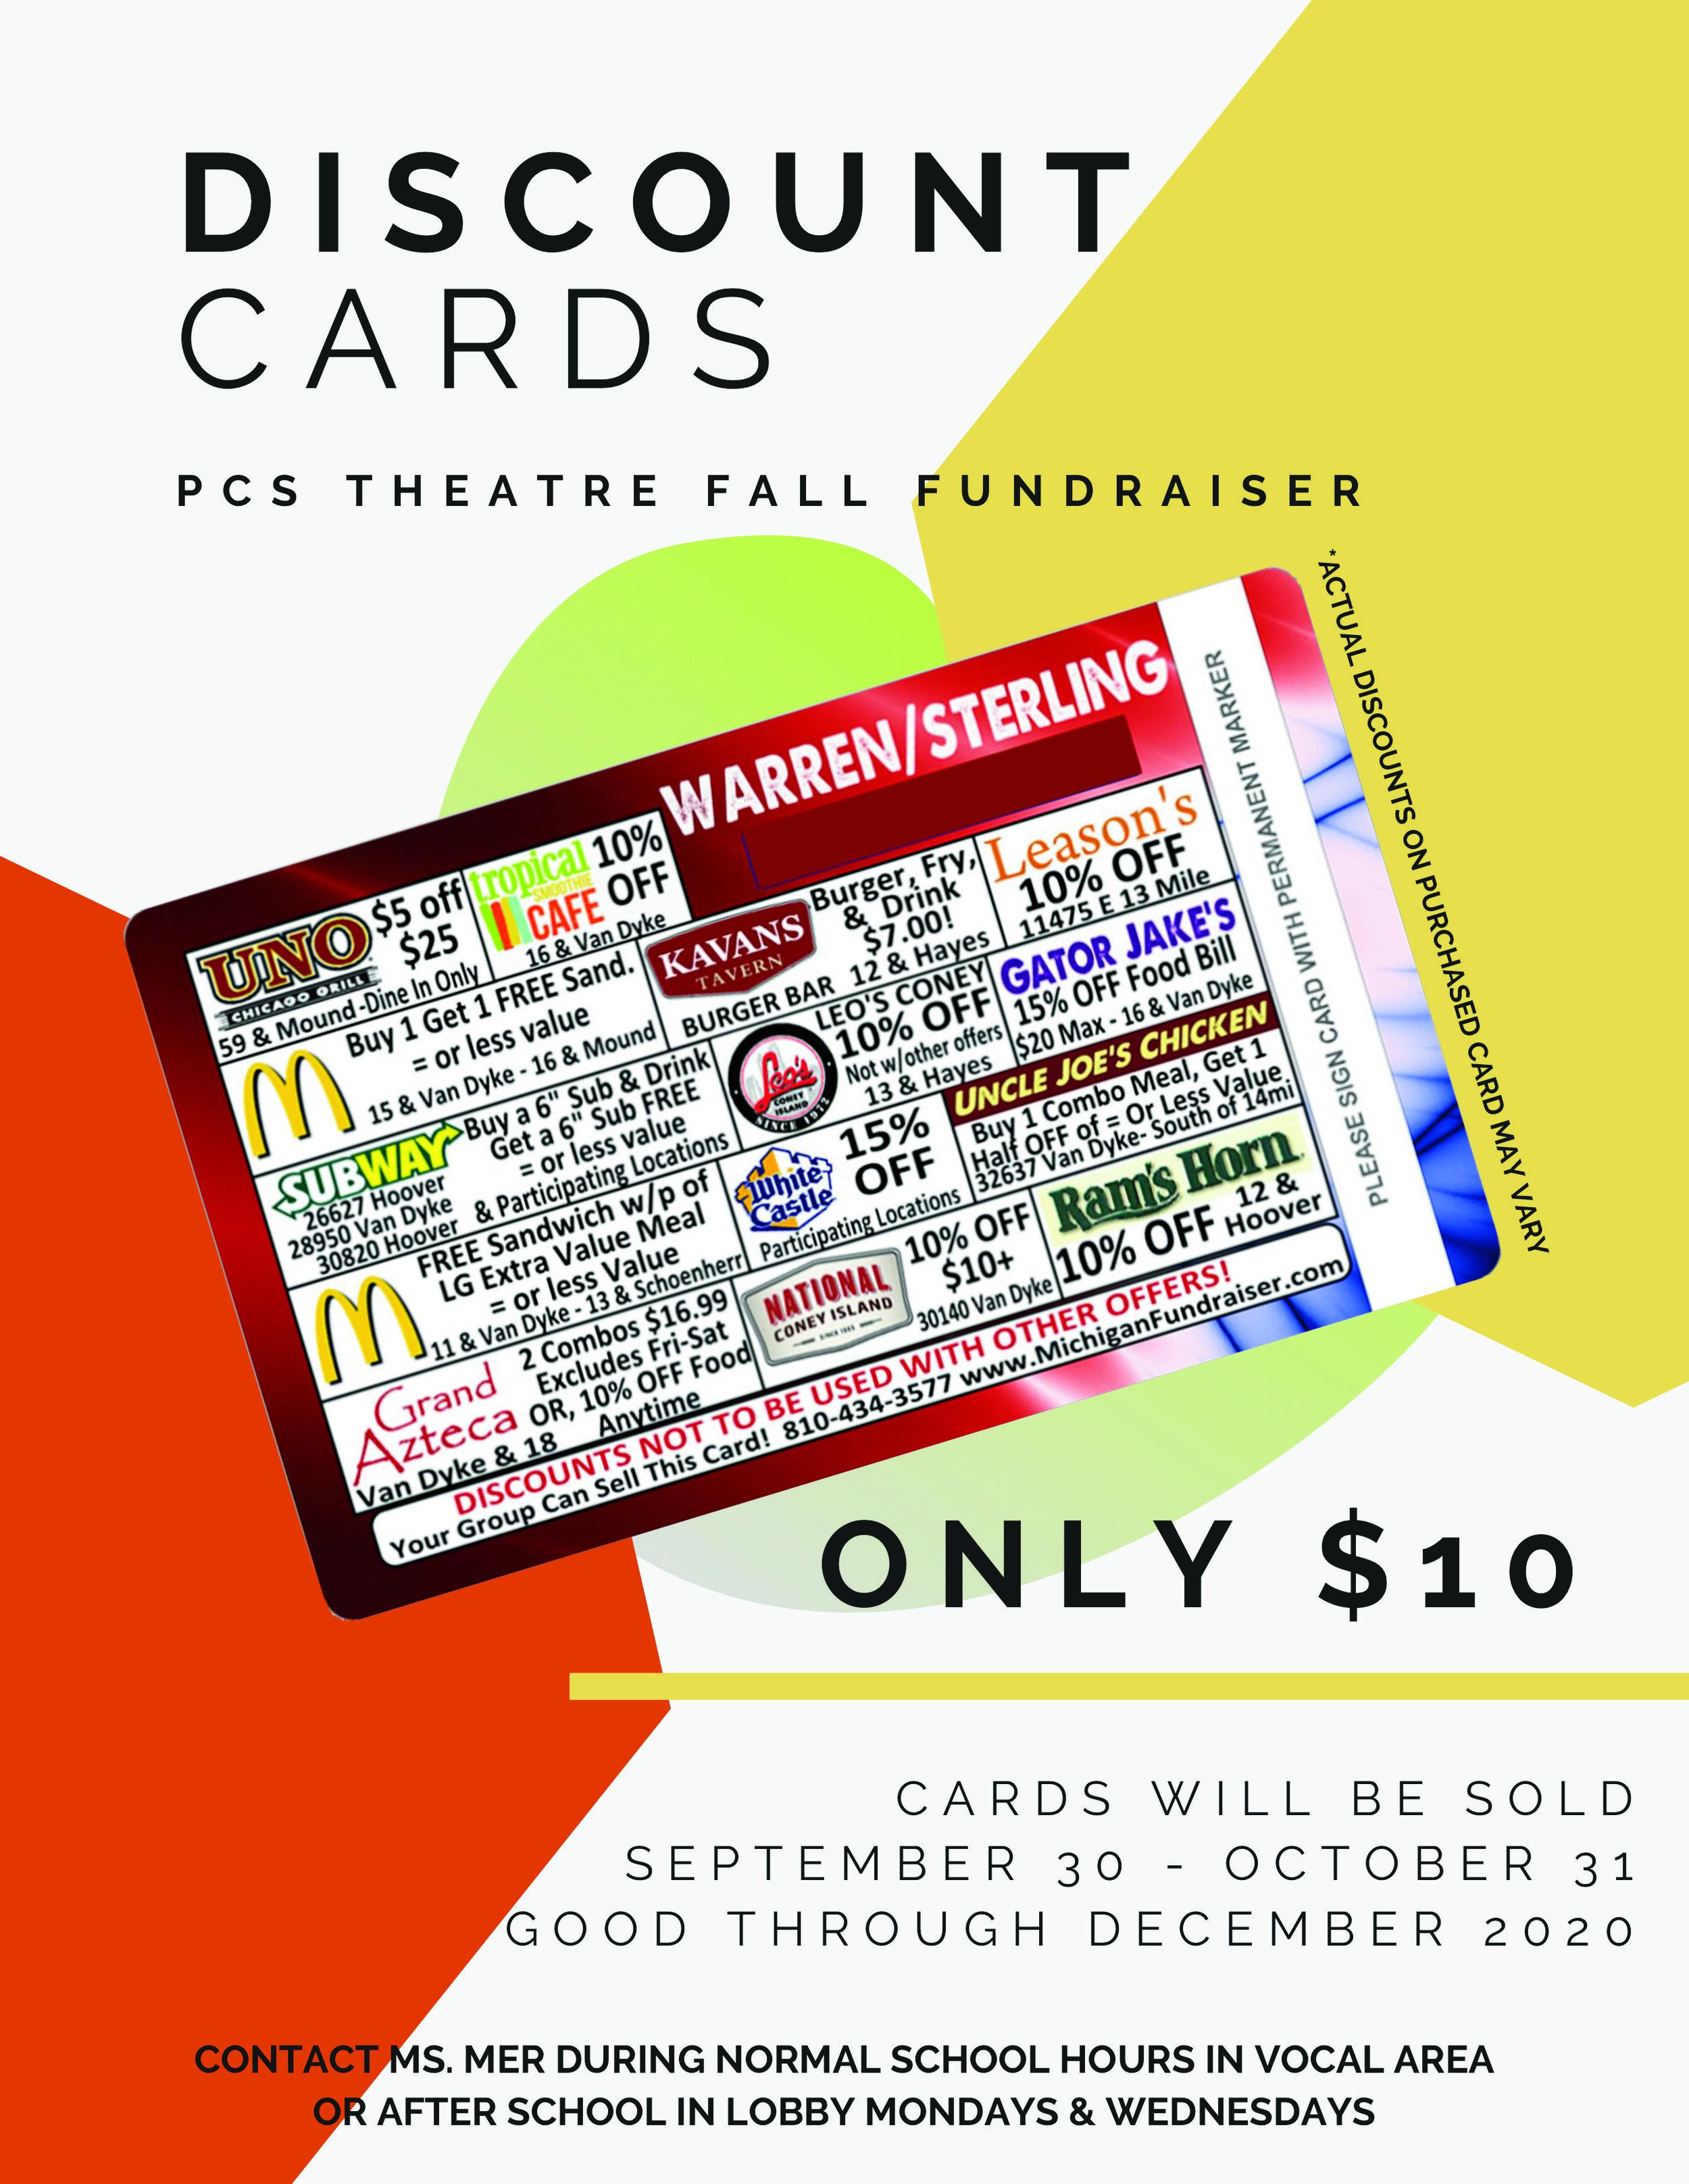 Discount_Card_Fundraiser-1_cmyk.jpg